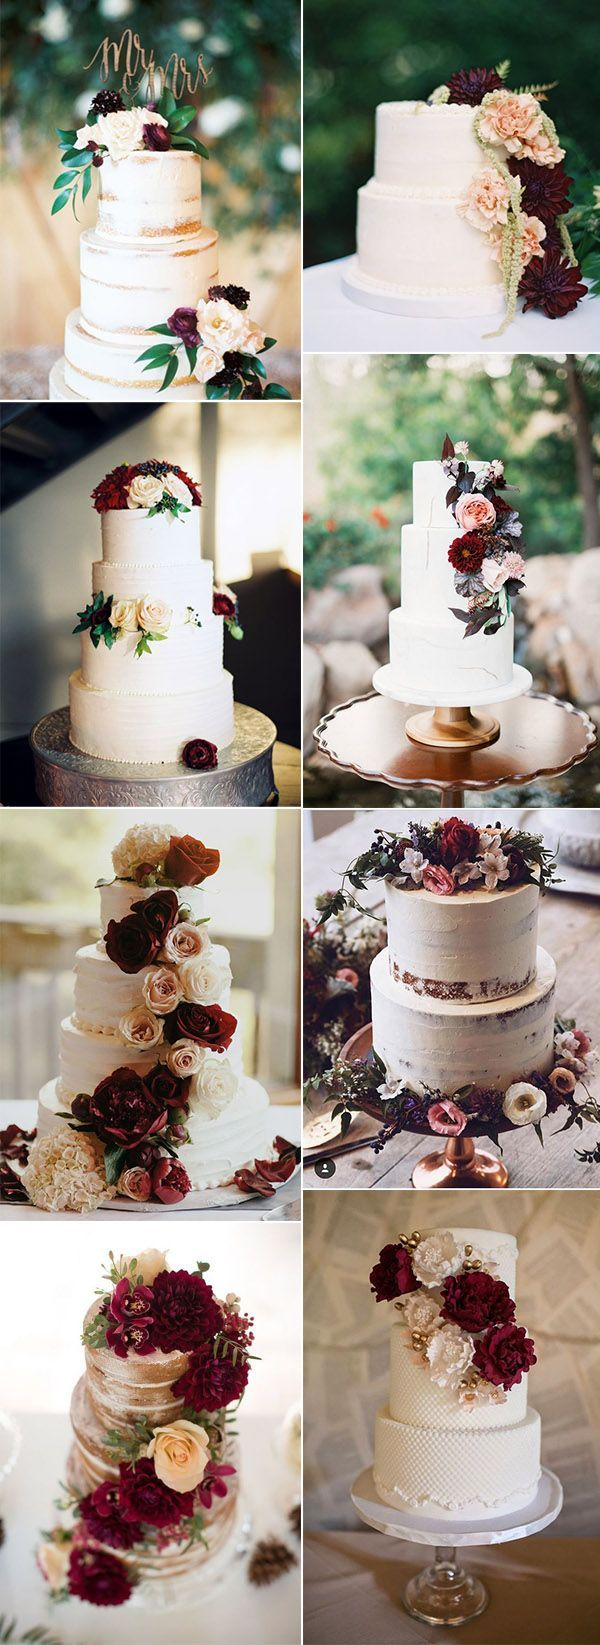 Wedding decorations outdoor october 2018  best Pakouus wedding images on Pinterest  Wedding ideas Wedding